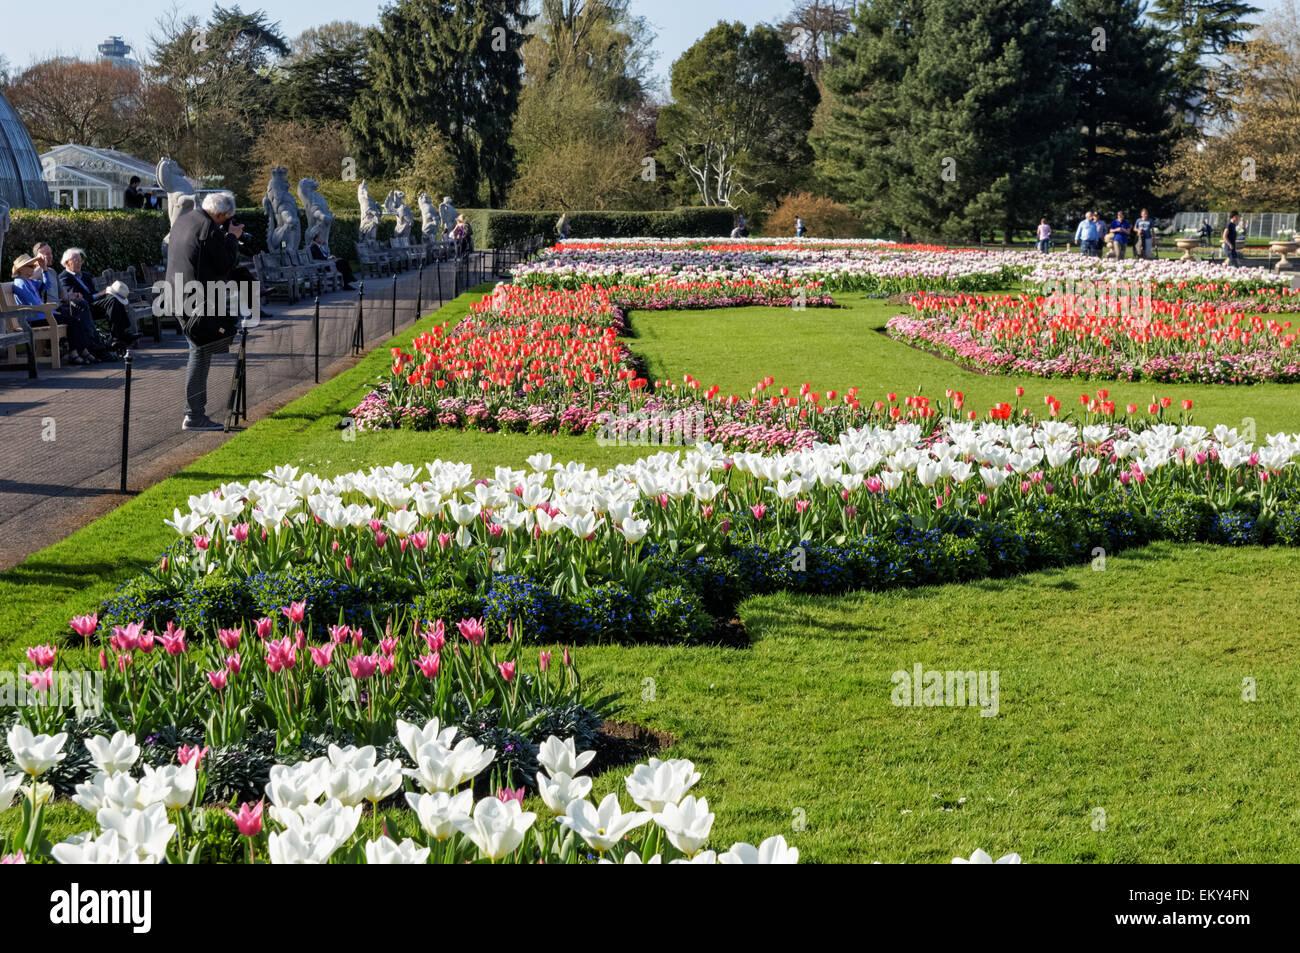 People enjoying sunny weather in the Royal Botanic Gardens, Kew ...